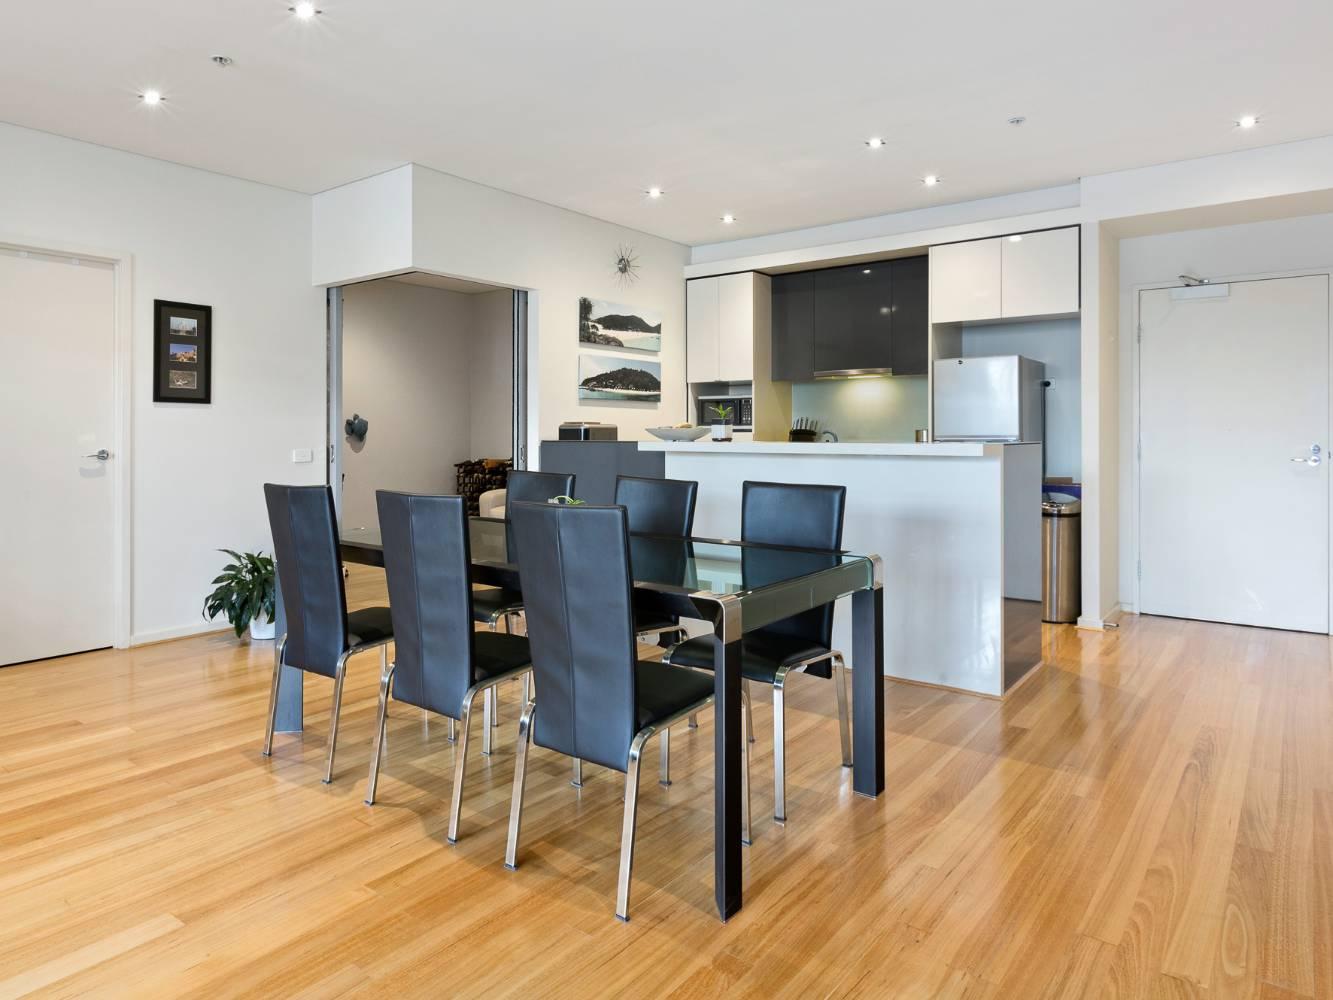 Home Exchange in Port Melbourne, Melbourne, VIC - Aussie ...